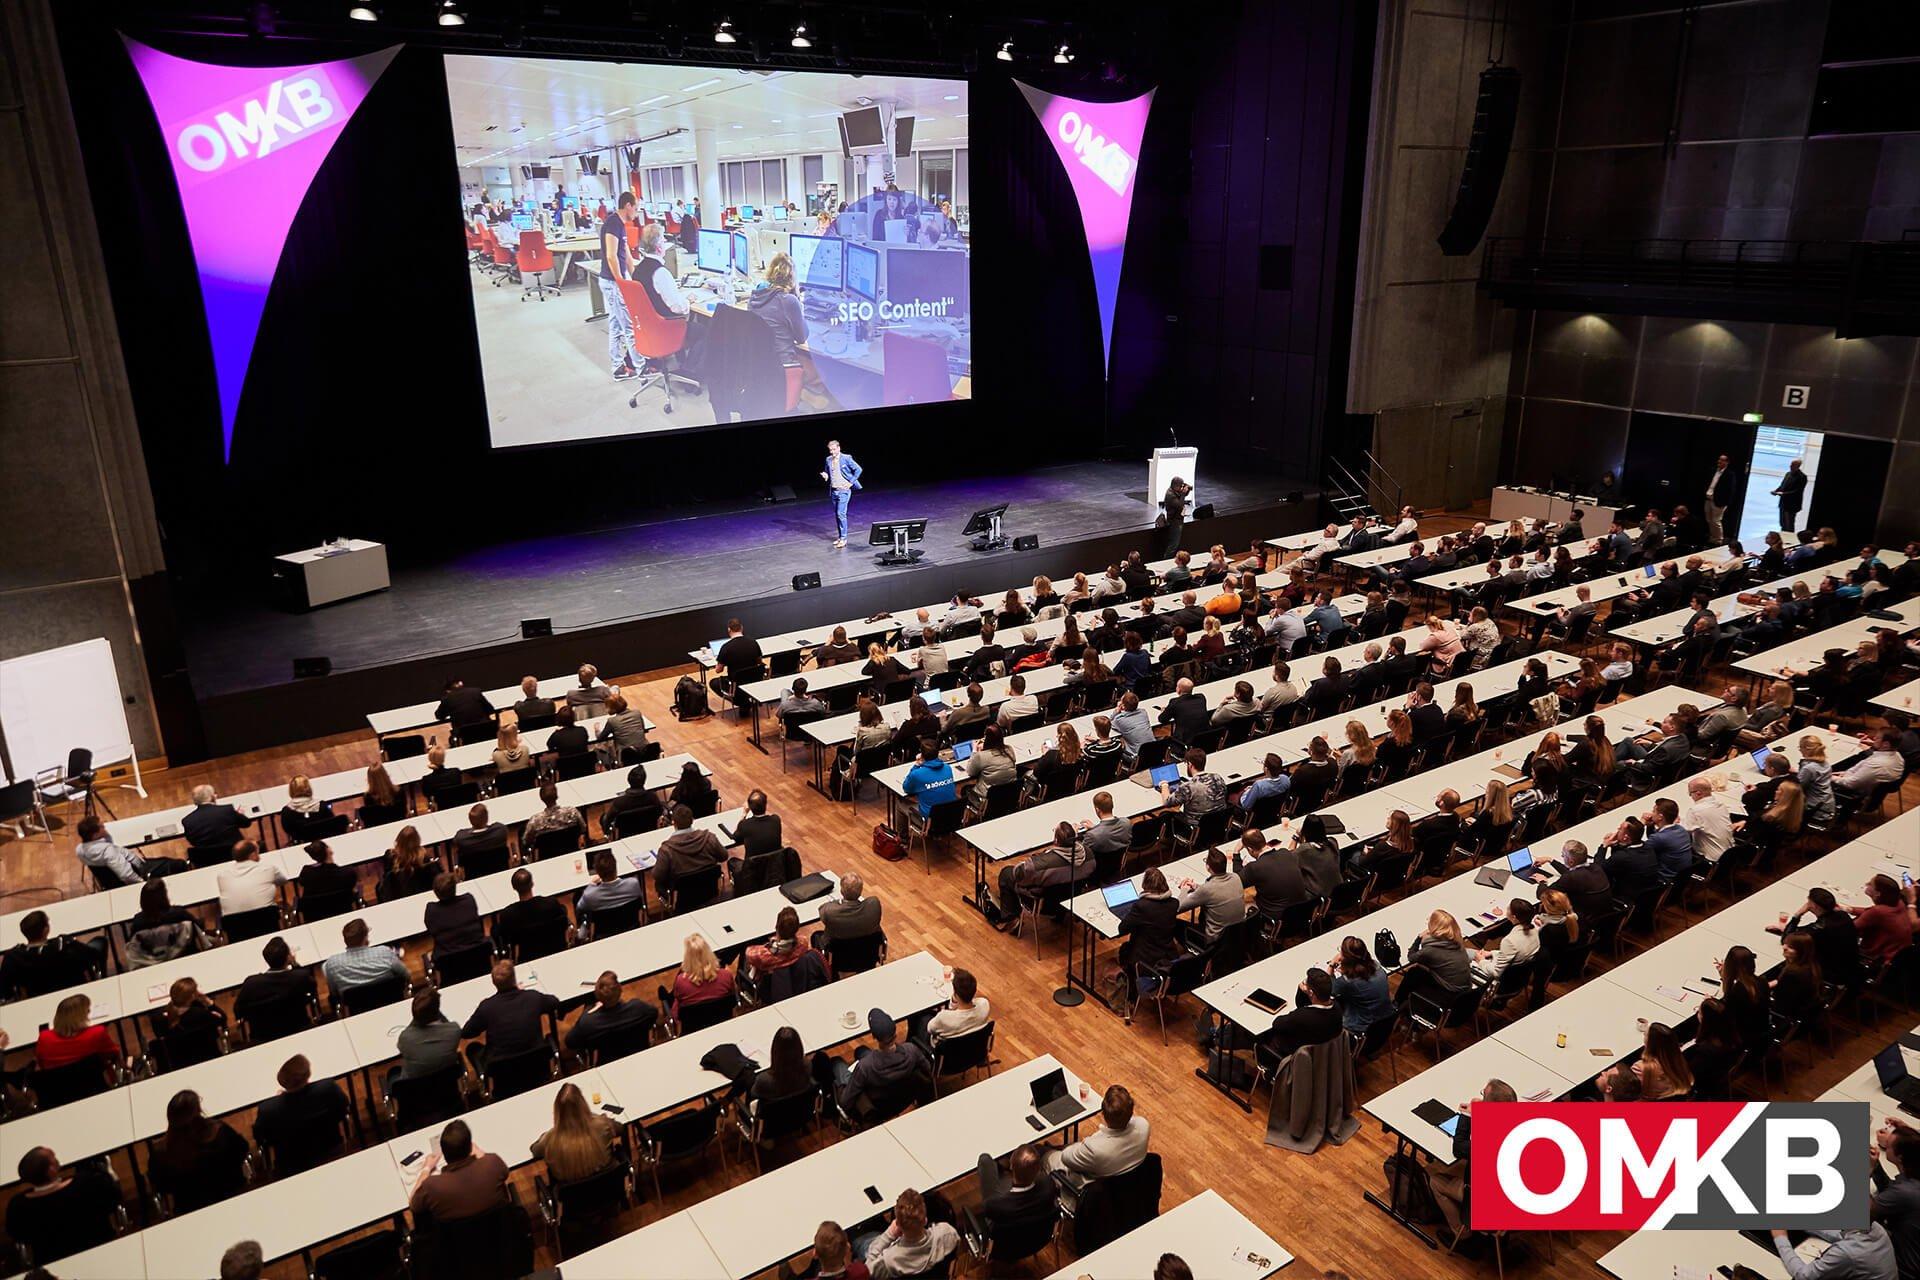 OMKB Konferenzbesuch 2019 - Recap